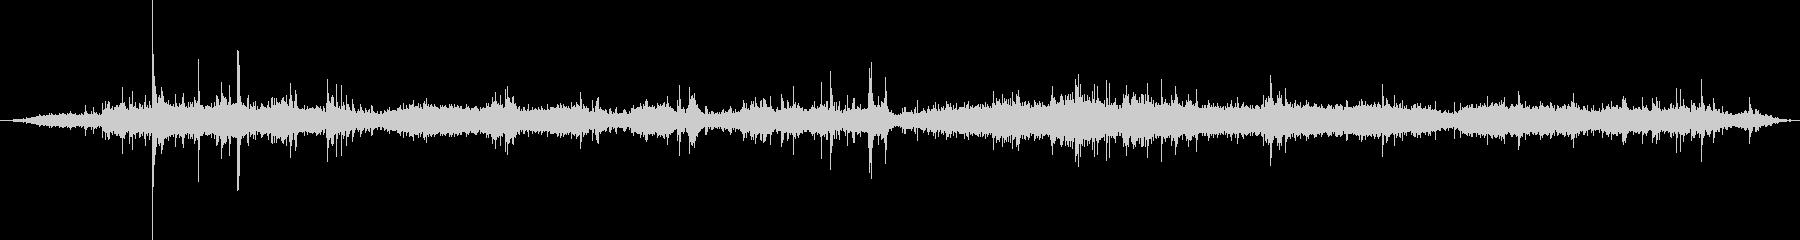 ASMR録音したシャワーを浴びる音の未再生の波形